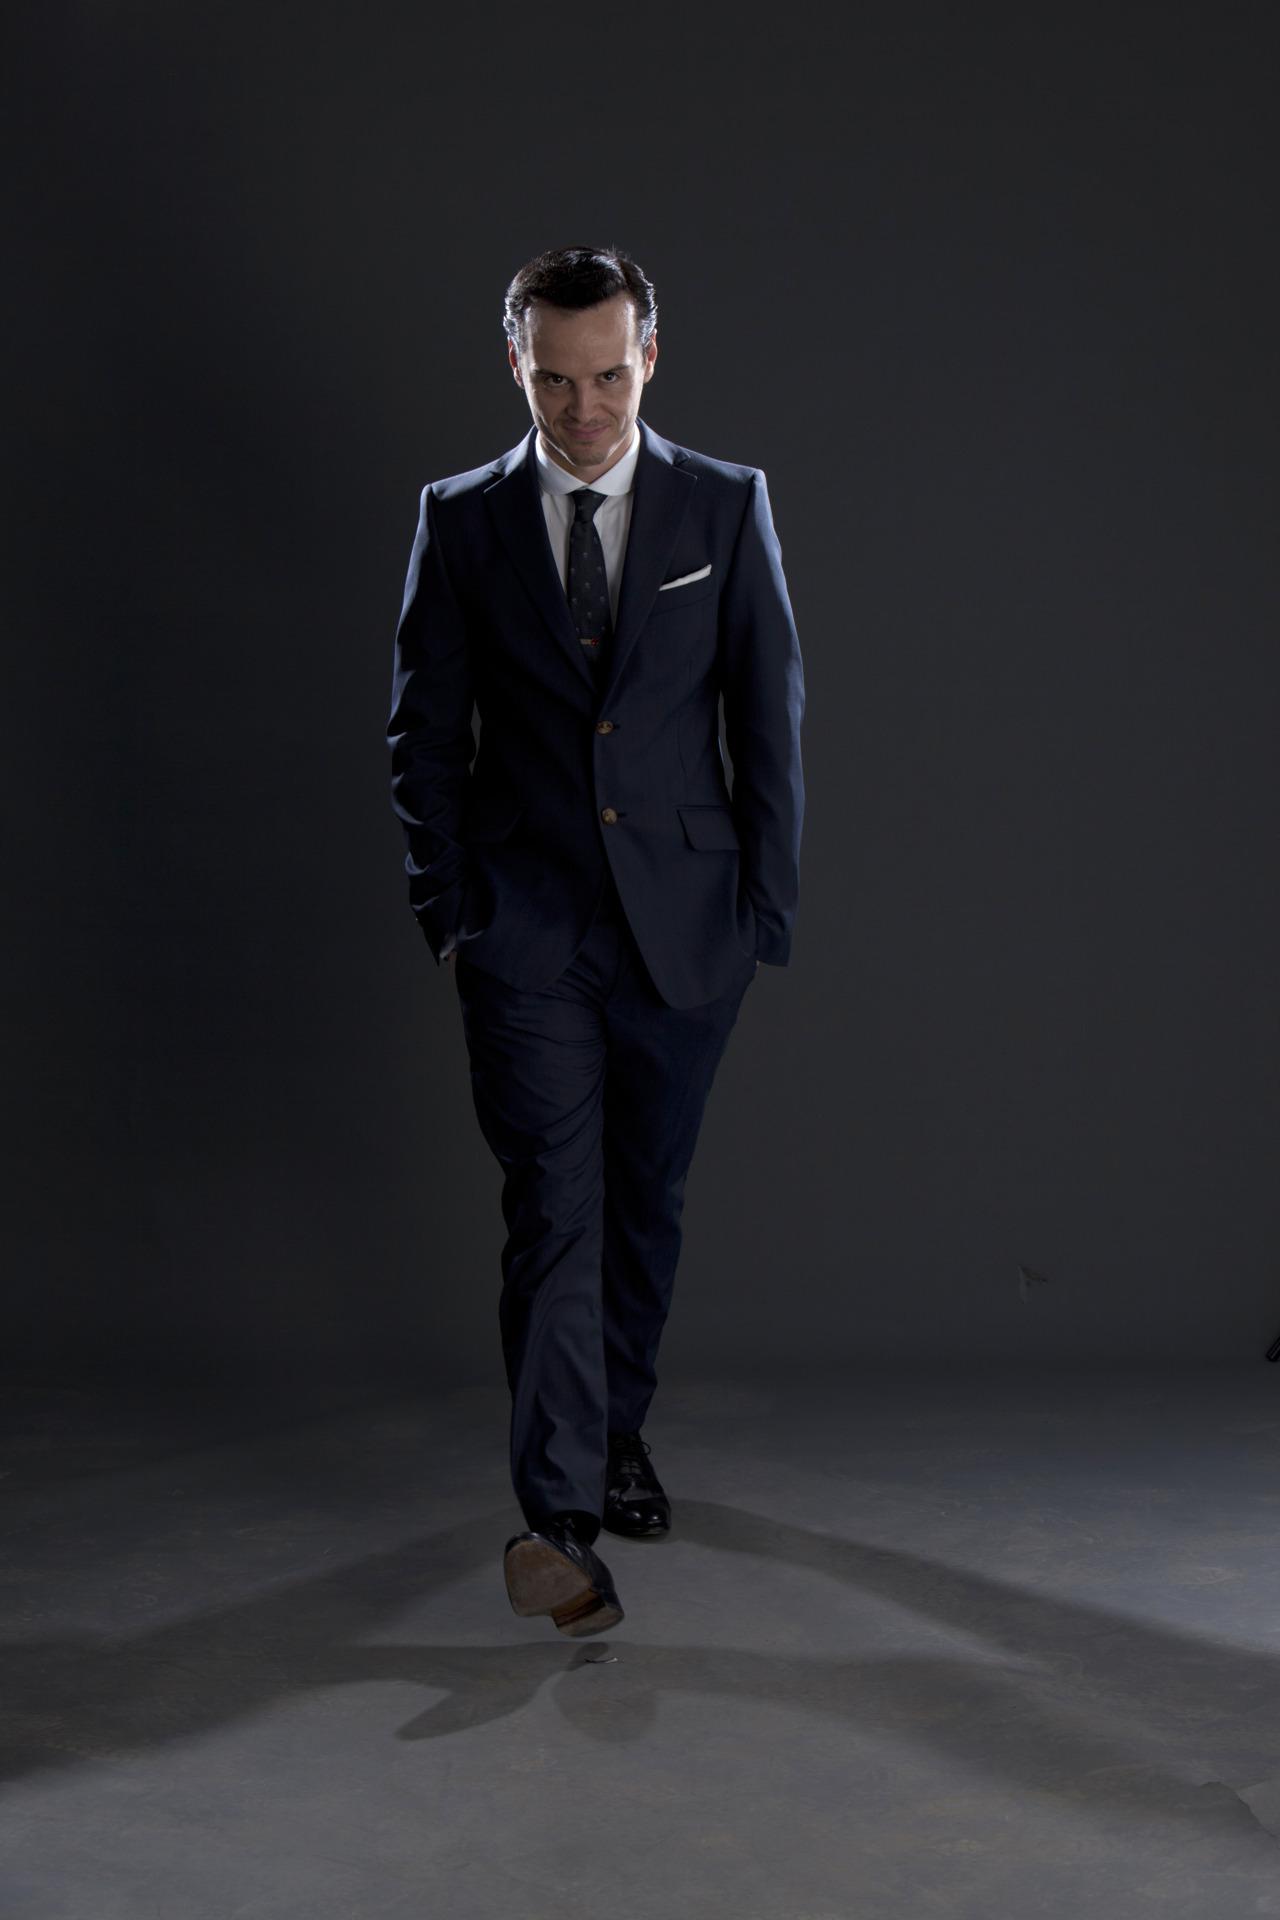 Jim Moriarty (BBC series)